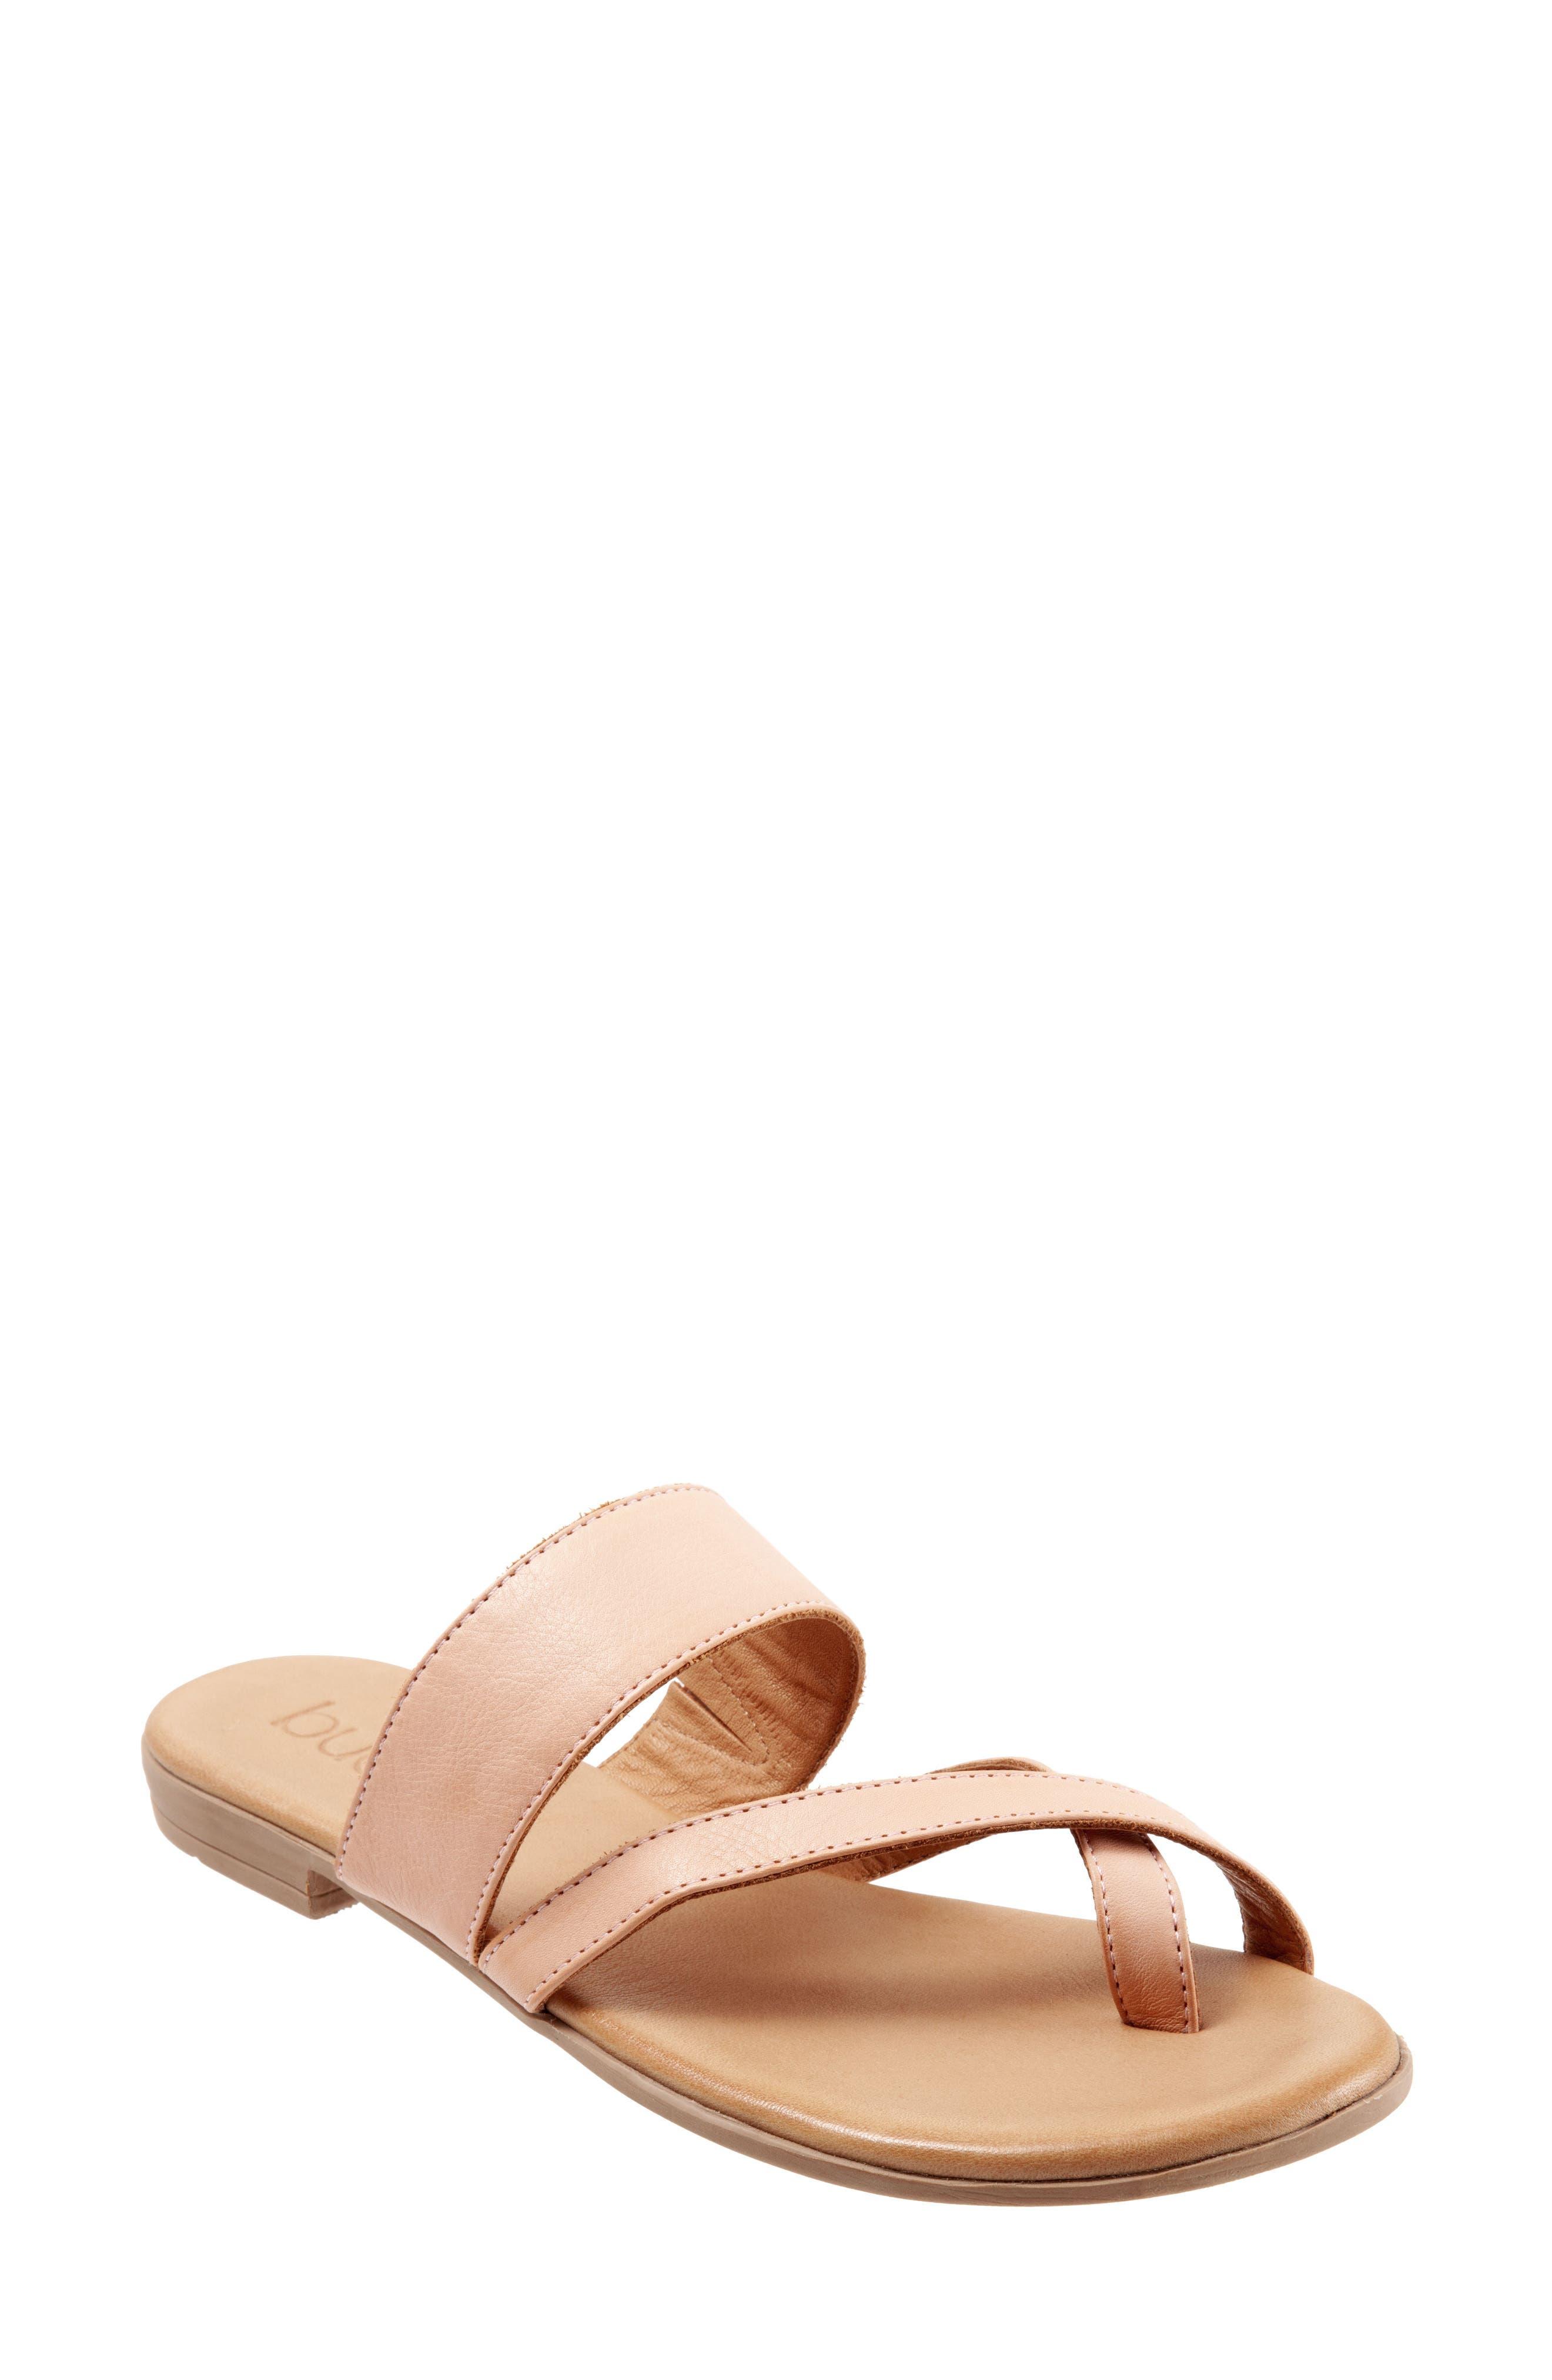 Jackson Toe Strap Slide Sandal